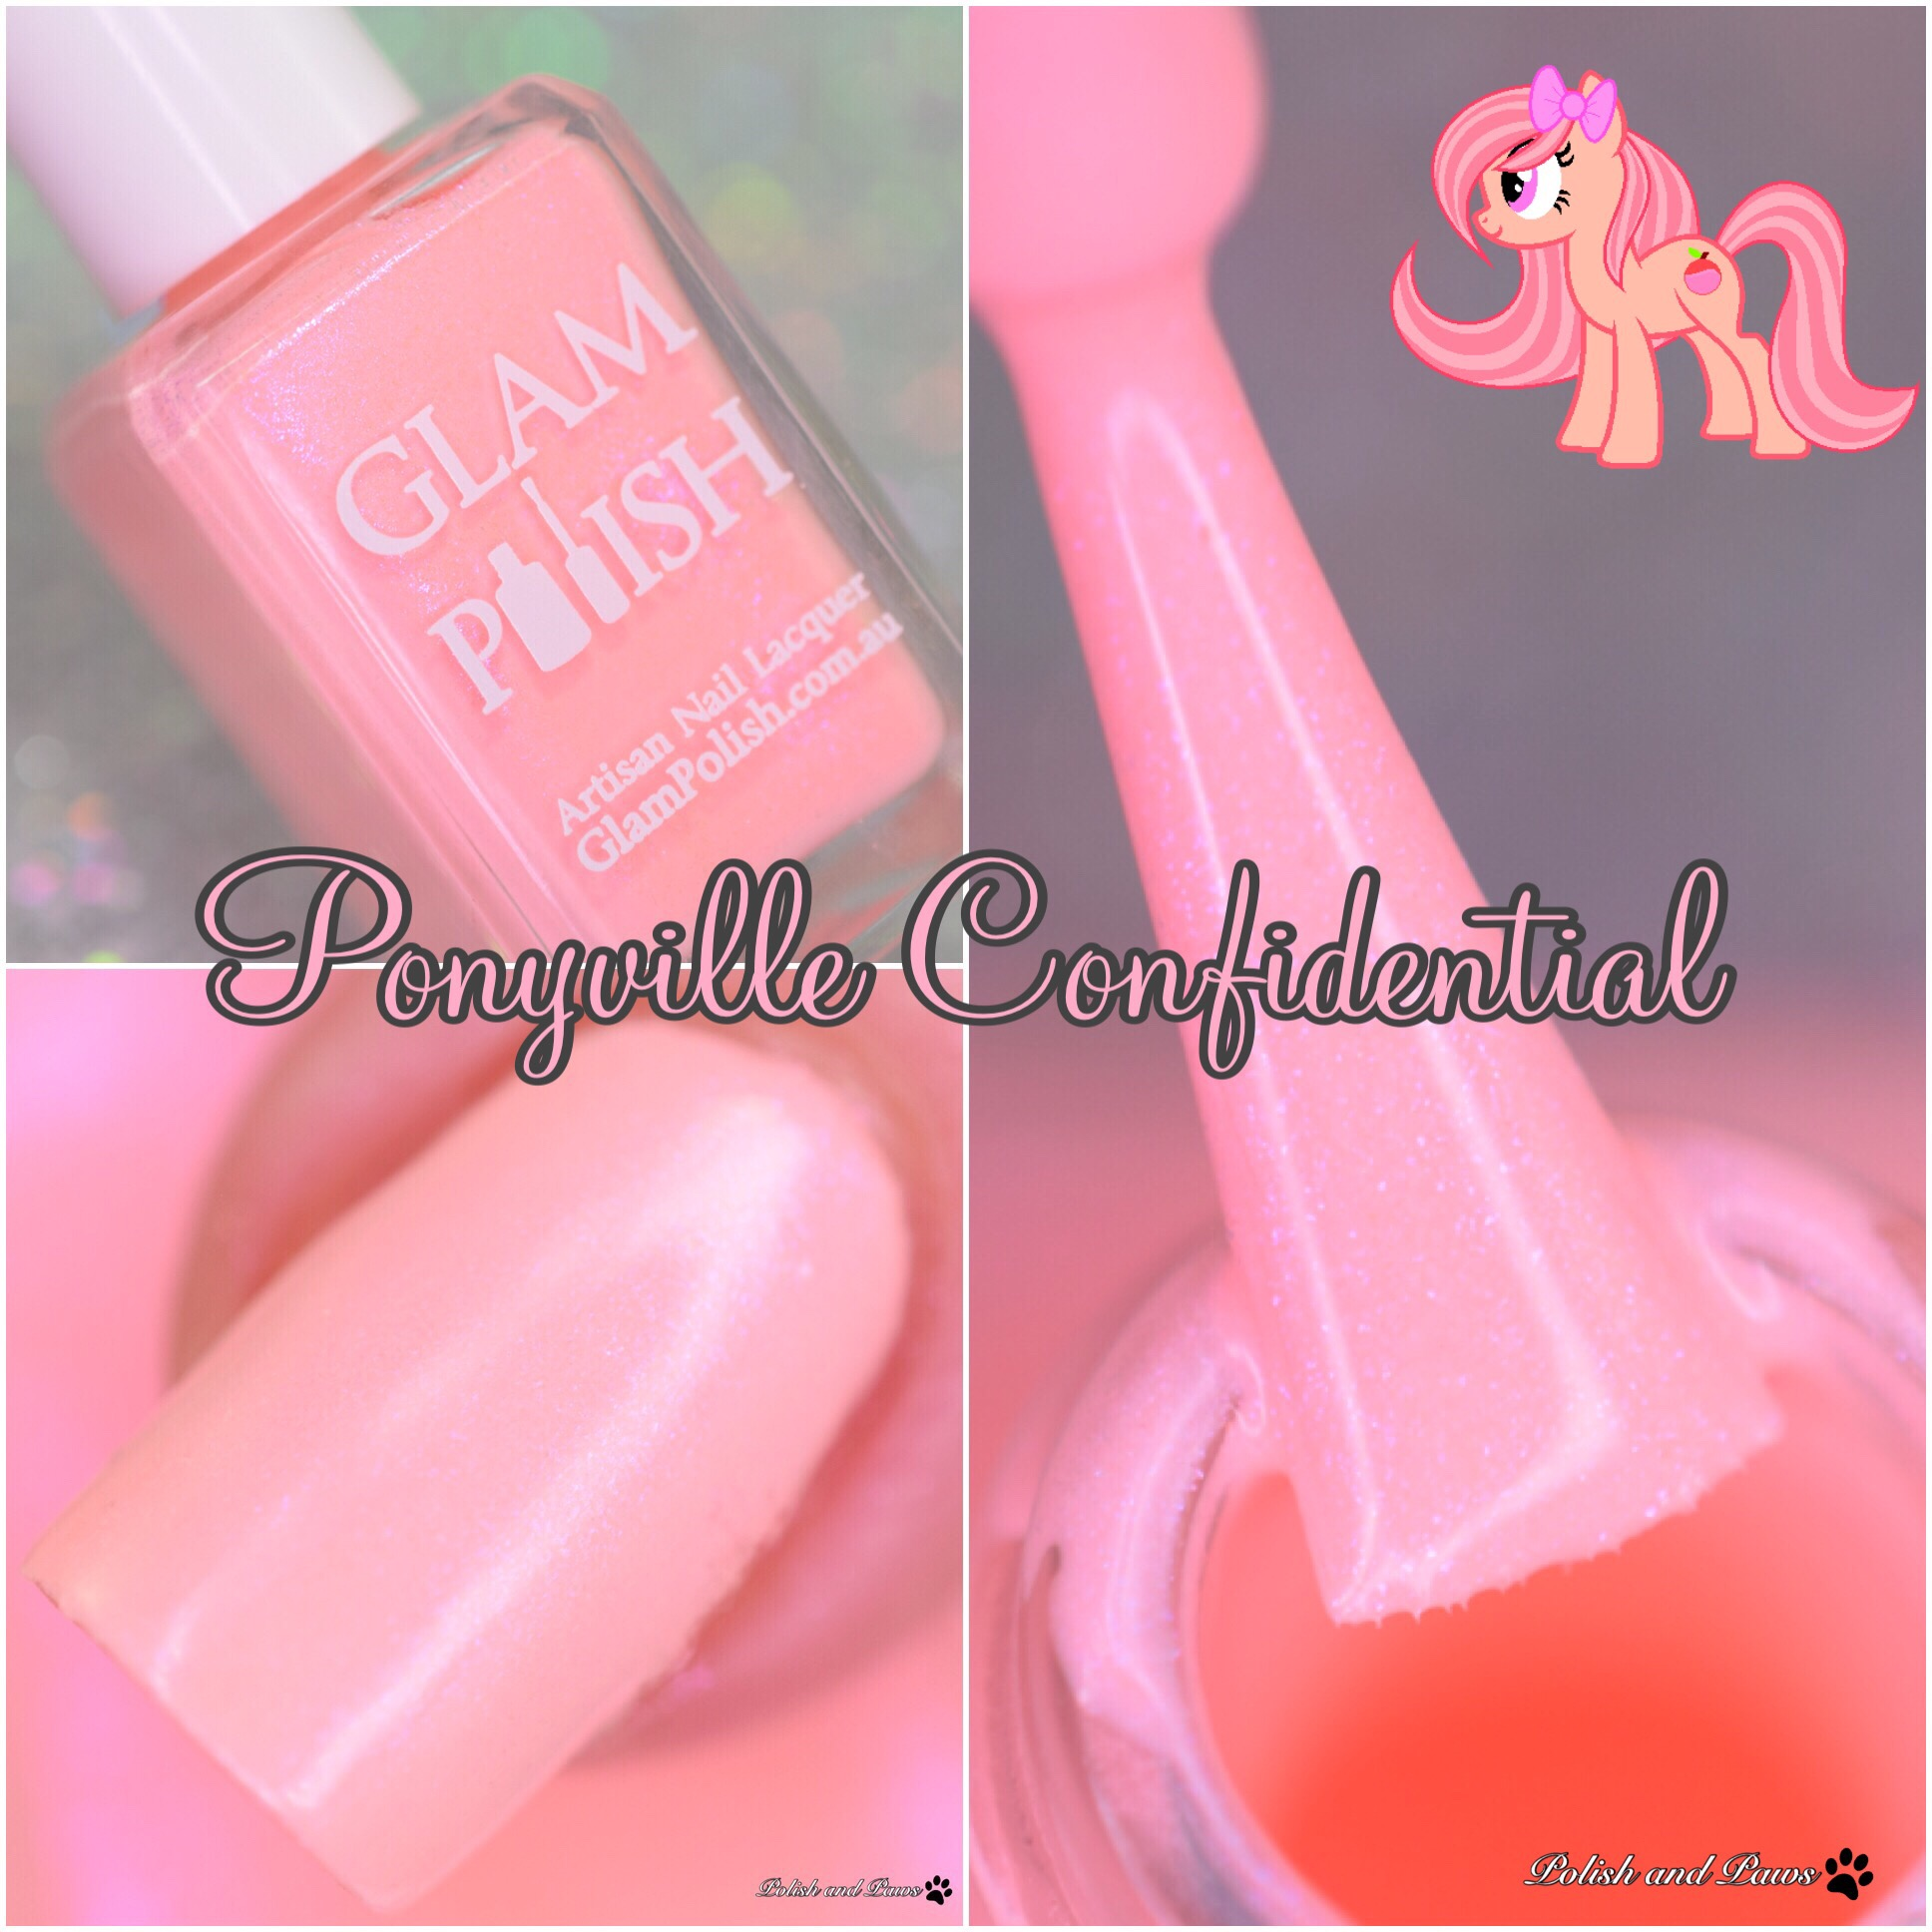 Glam Polish Ponyville Confidential